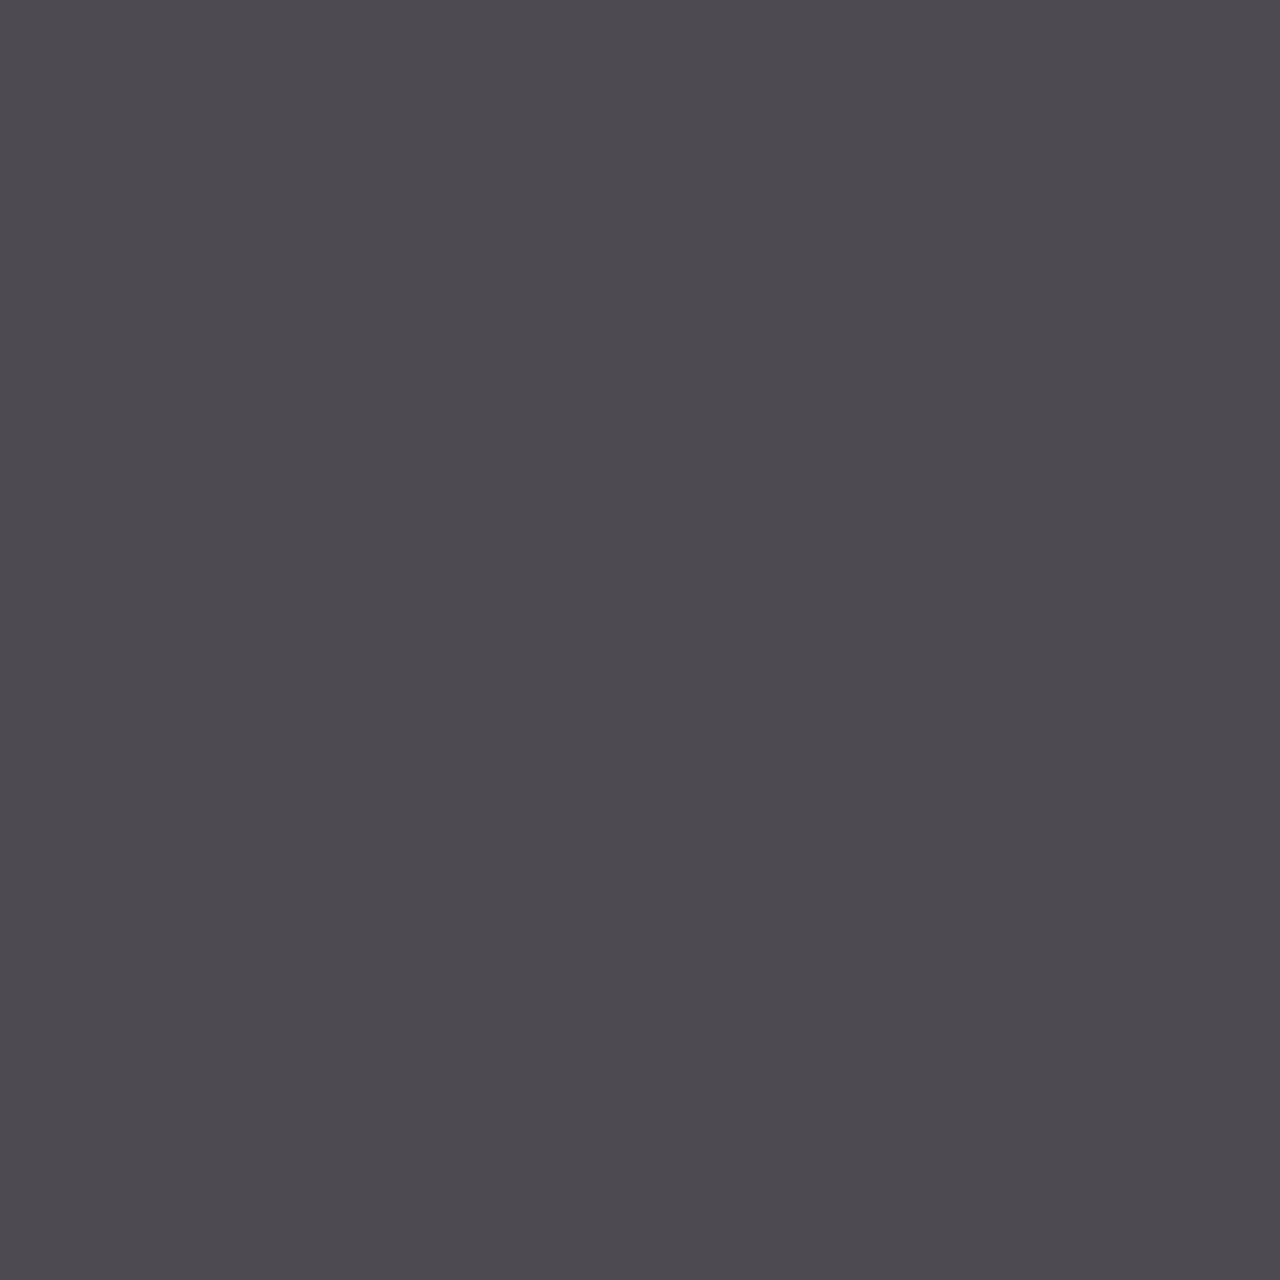 FRI-Seidenpapier de Luxe Formatware